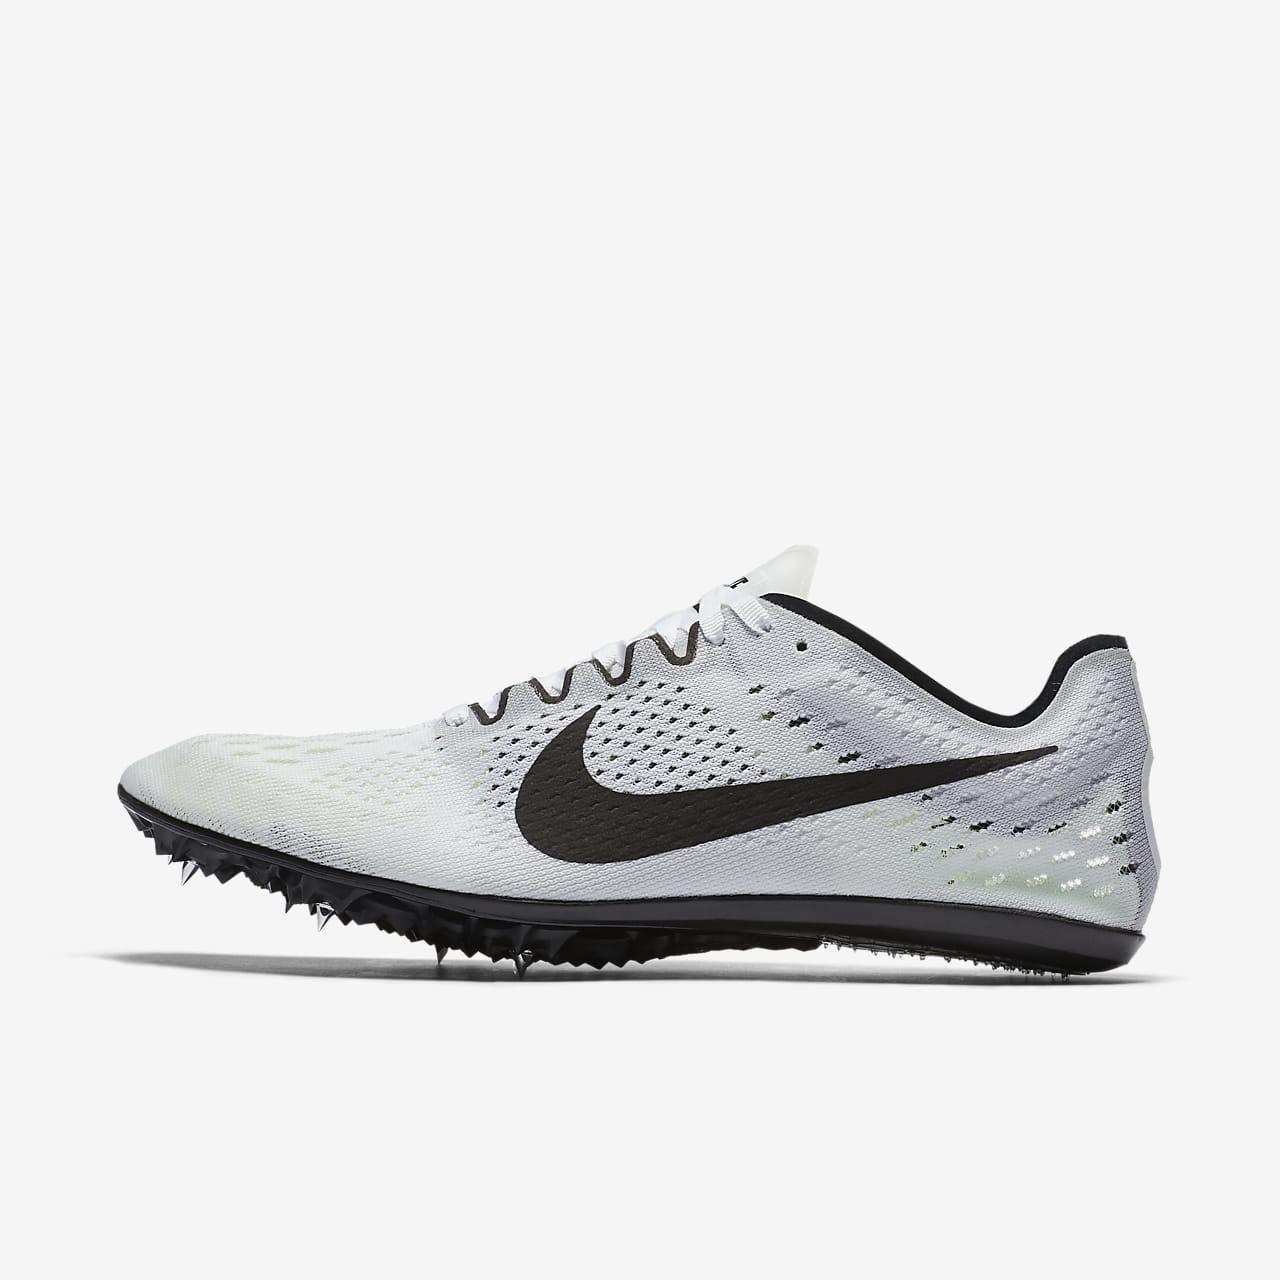 Scarpa chiodata da gara Nike Zoom Victory 3